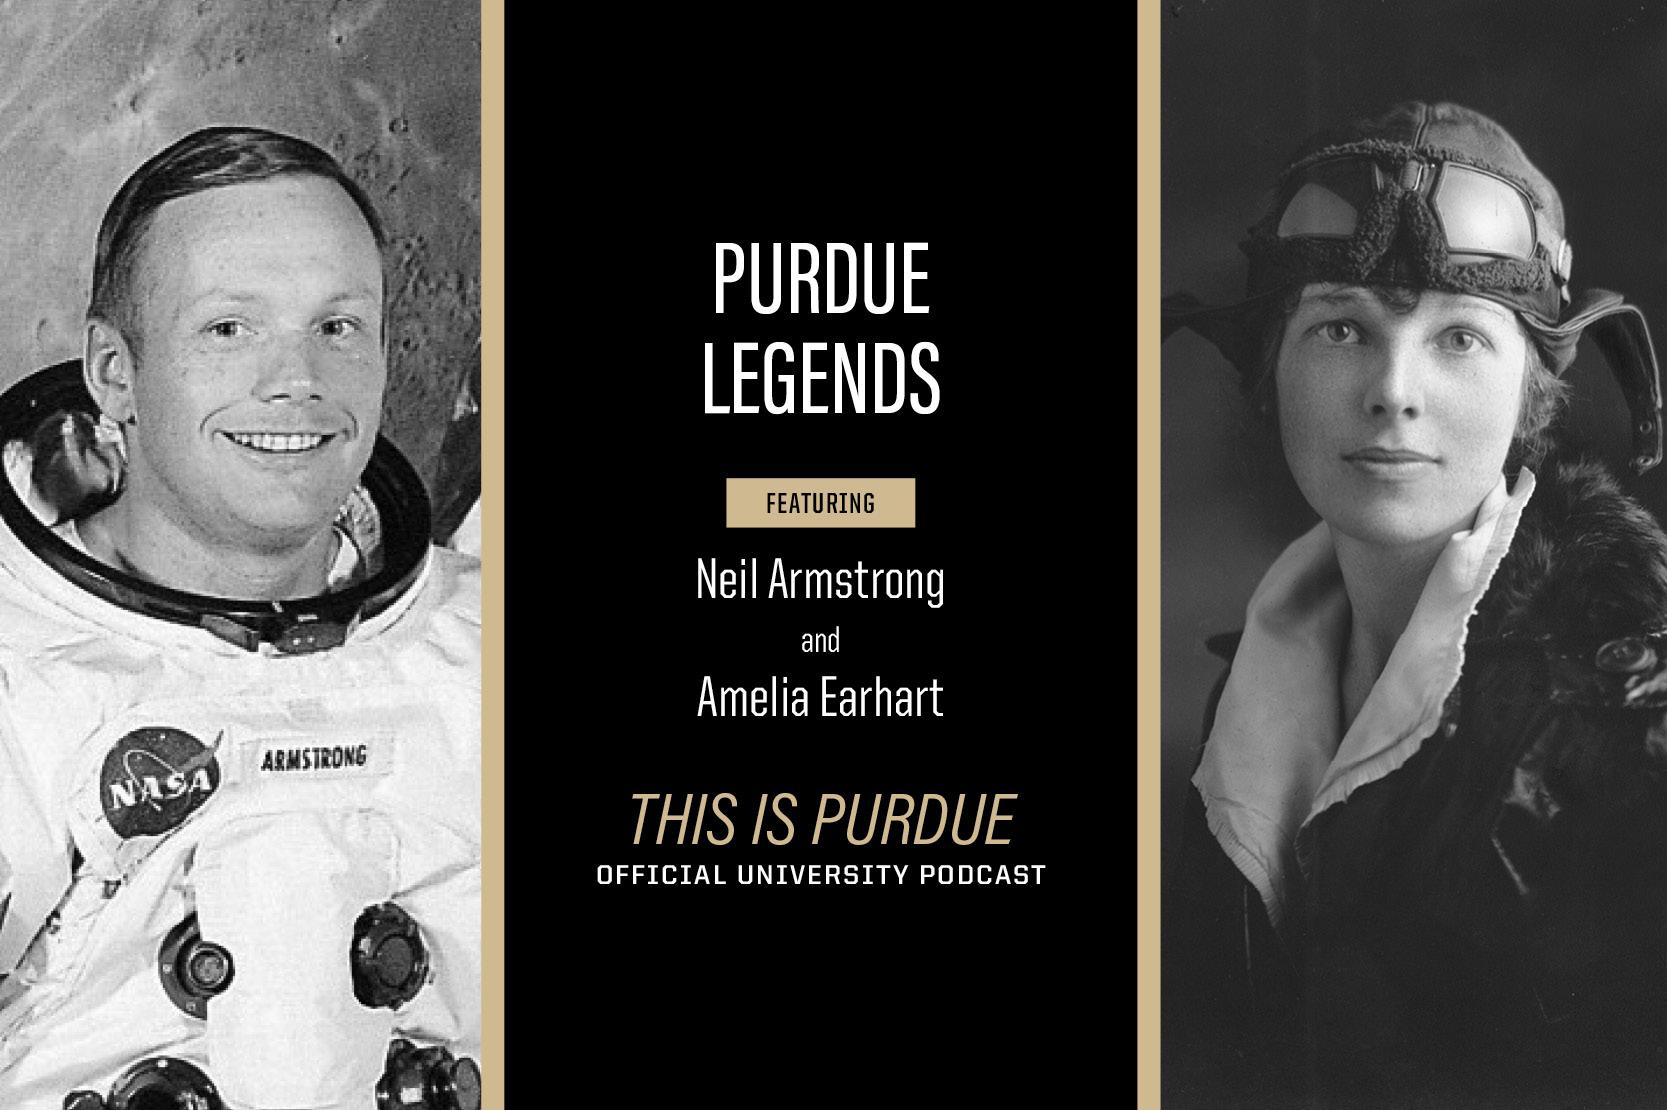 Purdue Legends